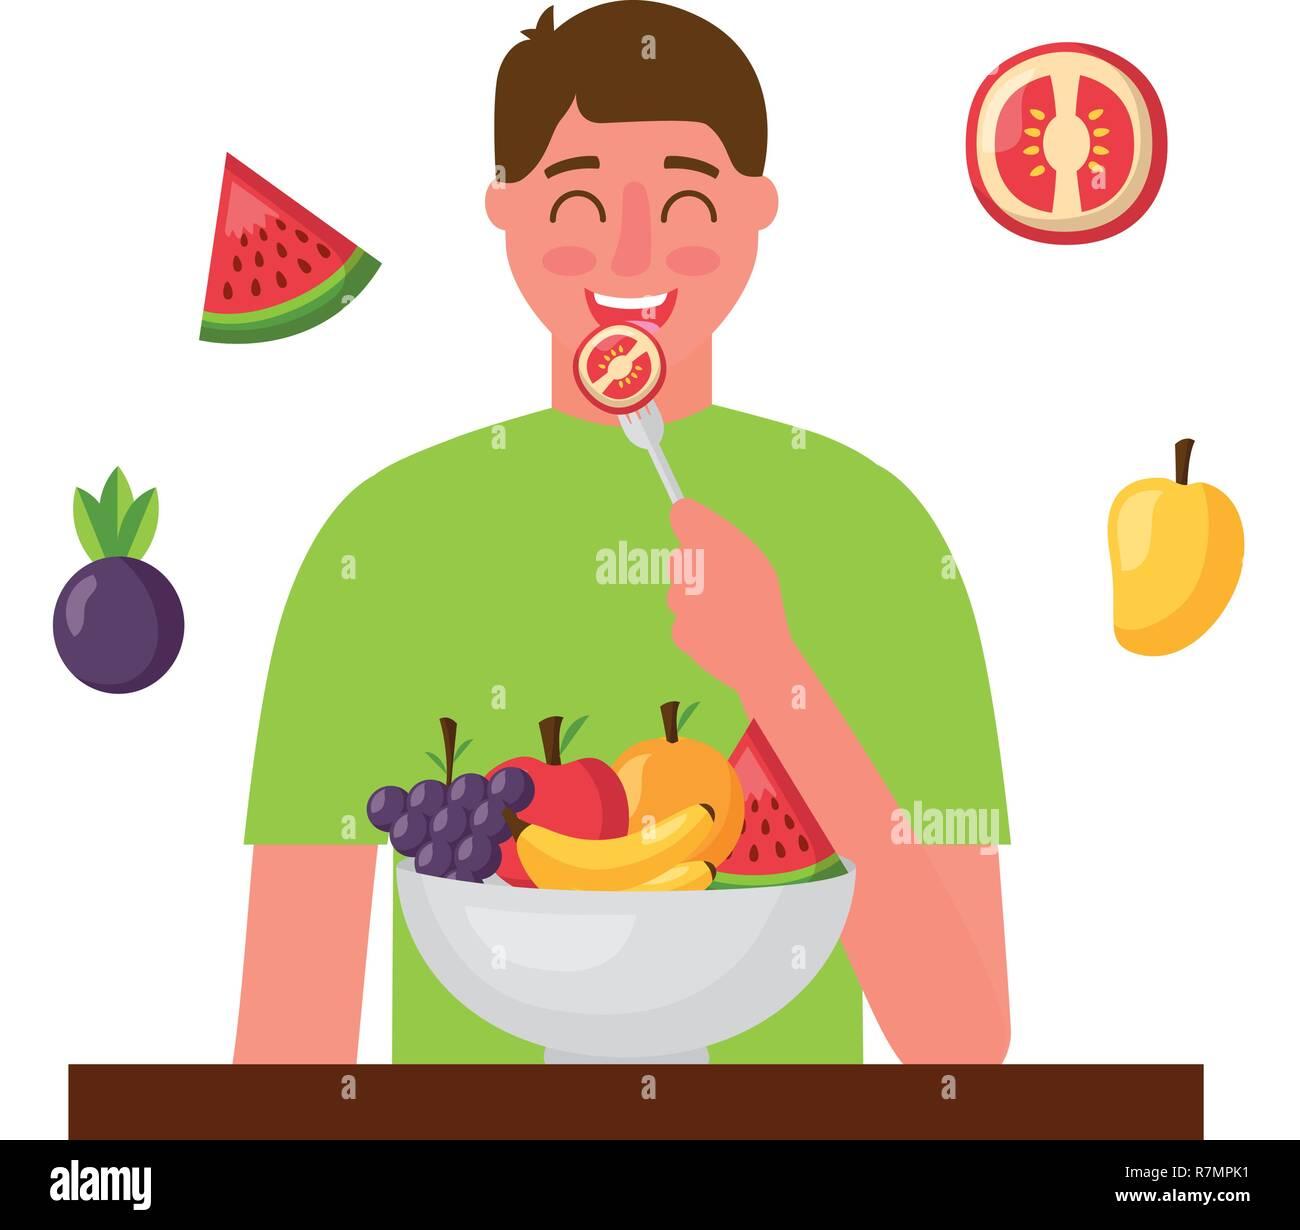 Man Eating Tomato Healthy Food Stock Vector Image Art Alamy